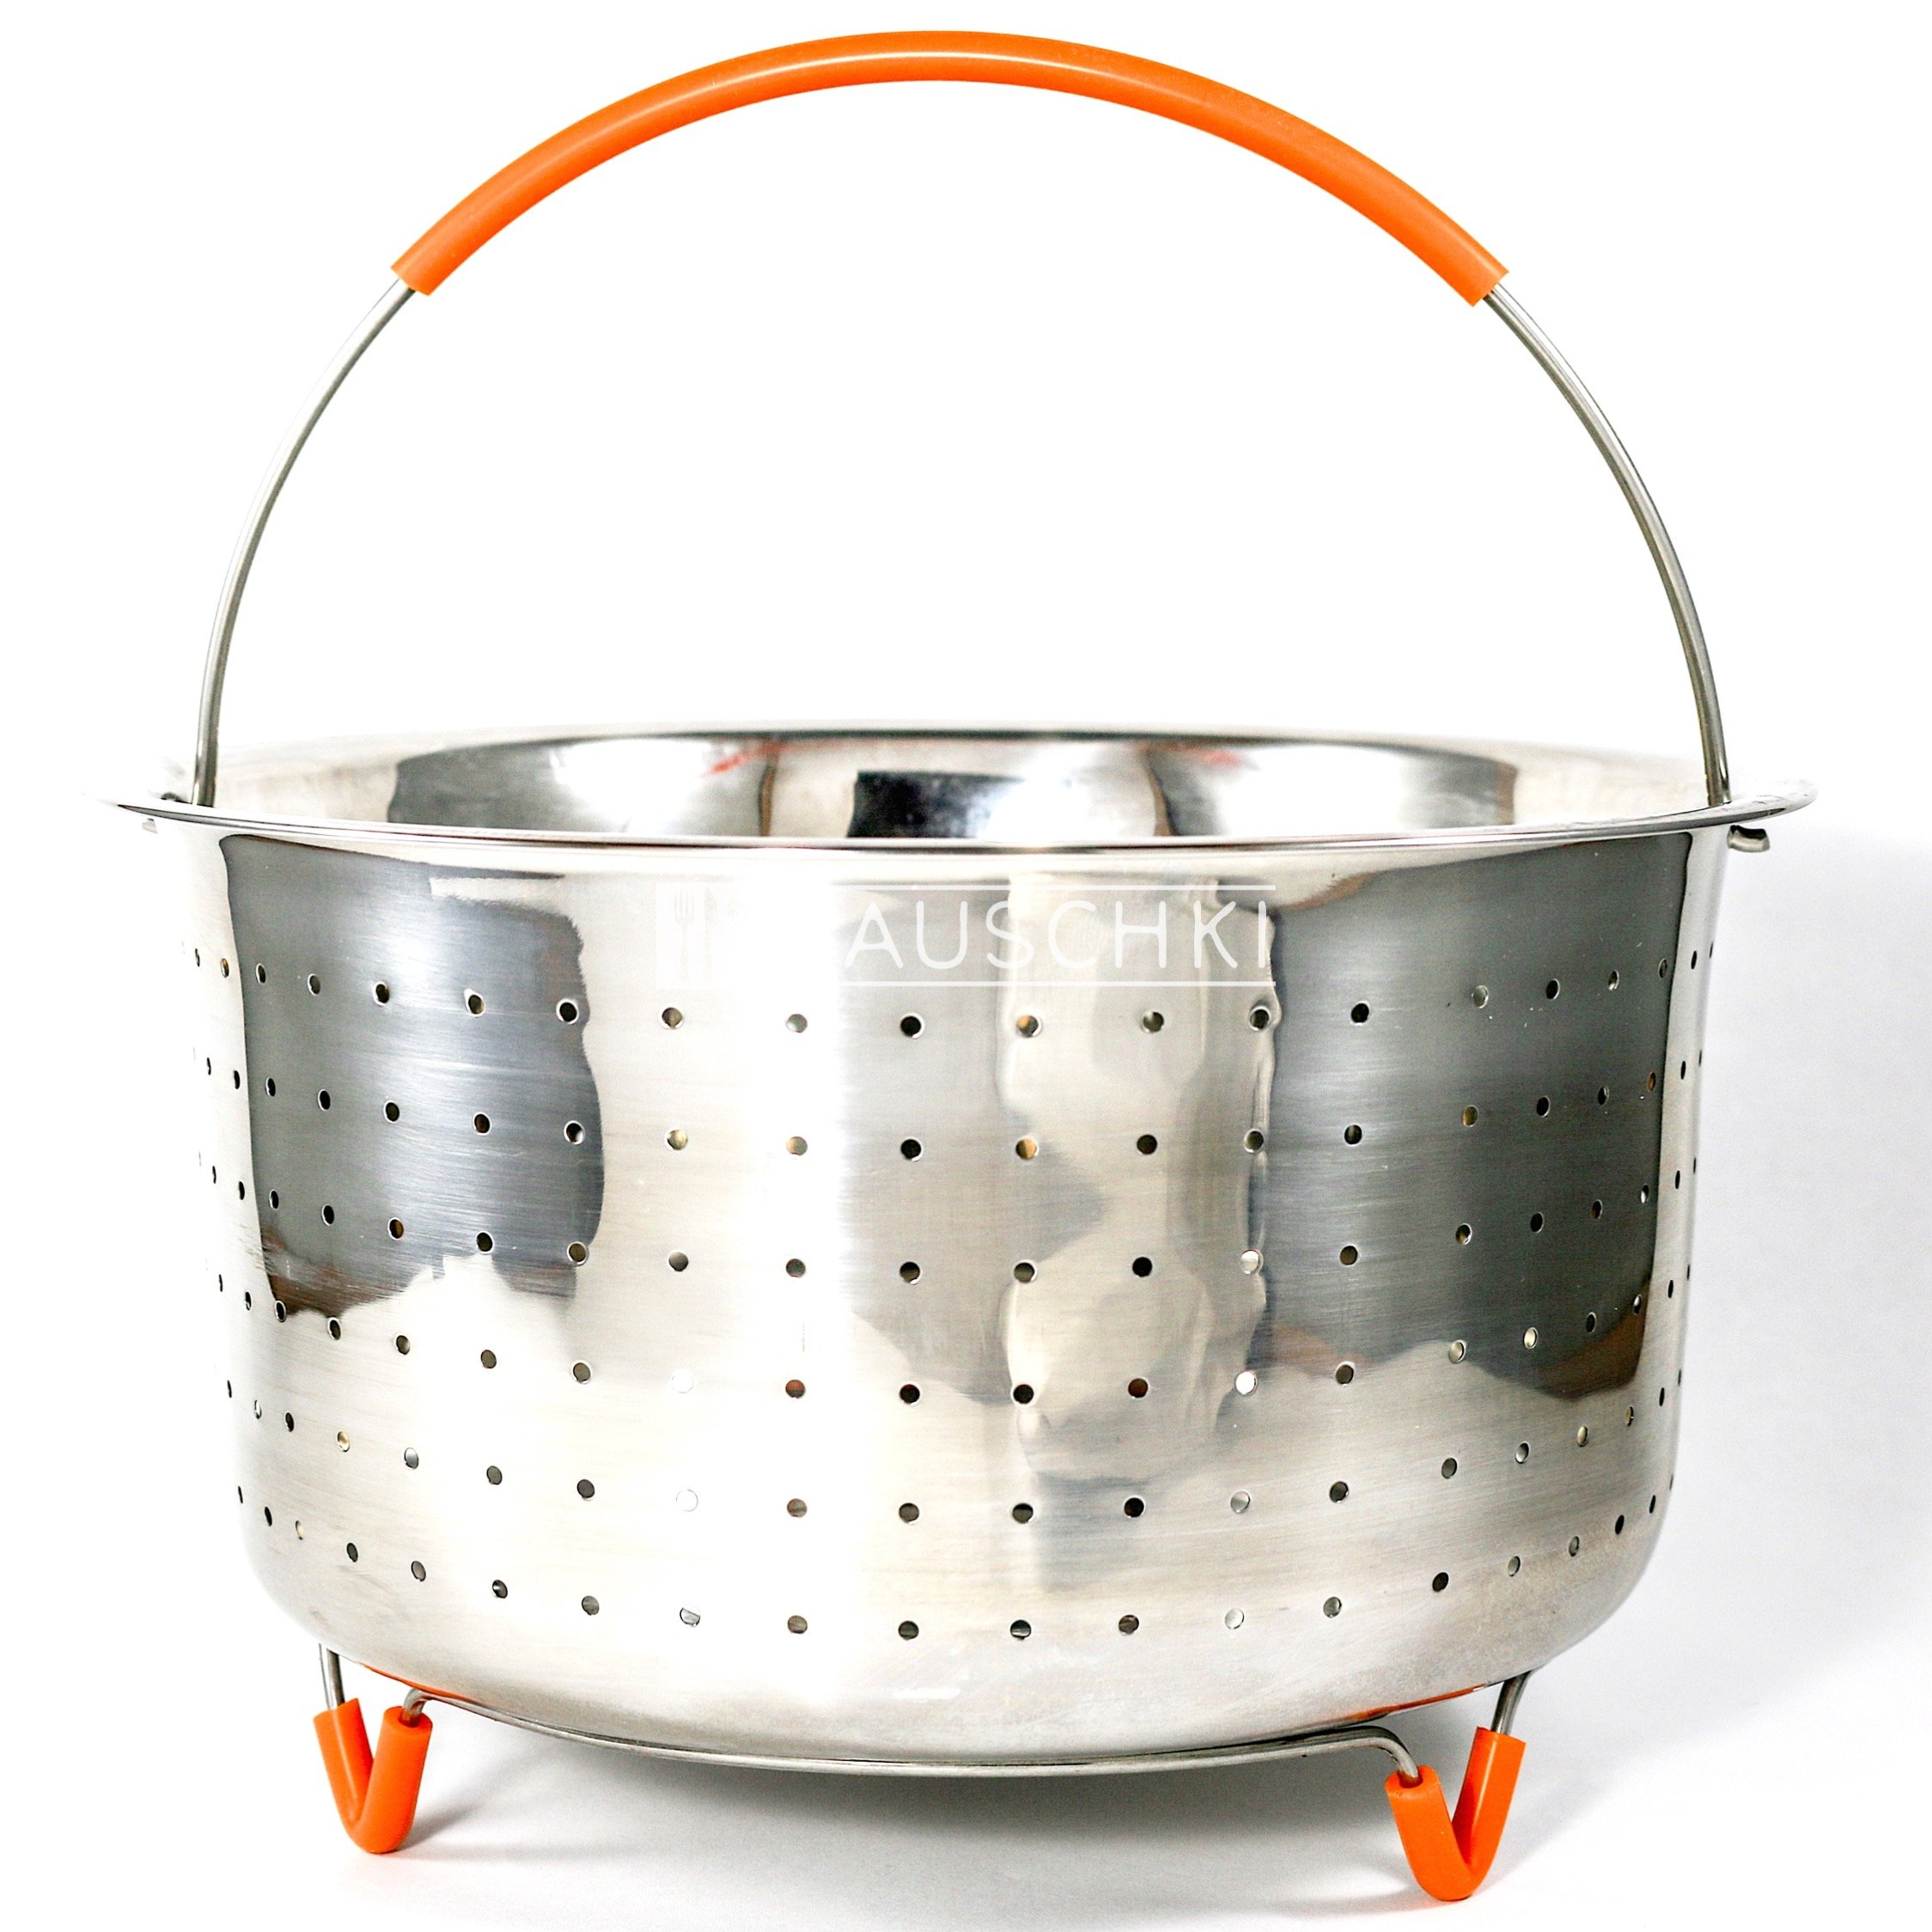 Bauschki Instant Pot Accessories, Vegetable Steamer Basket for instapot 6qt, 8qt - Egg Meat Food Rice Dumpling Cooker 6 qt, 8 quart Accessory - Stainless Steel, BPA Free Non-Slip Silicone Handle &Legs by Bauschki (Image #1)